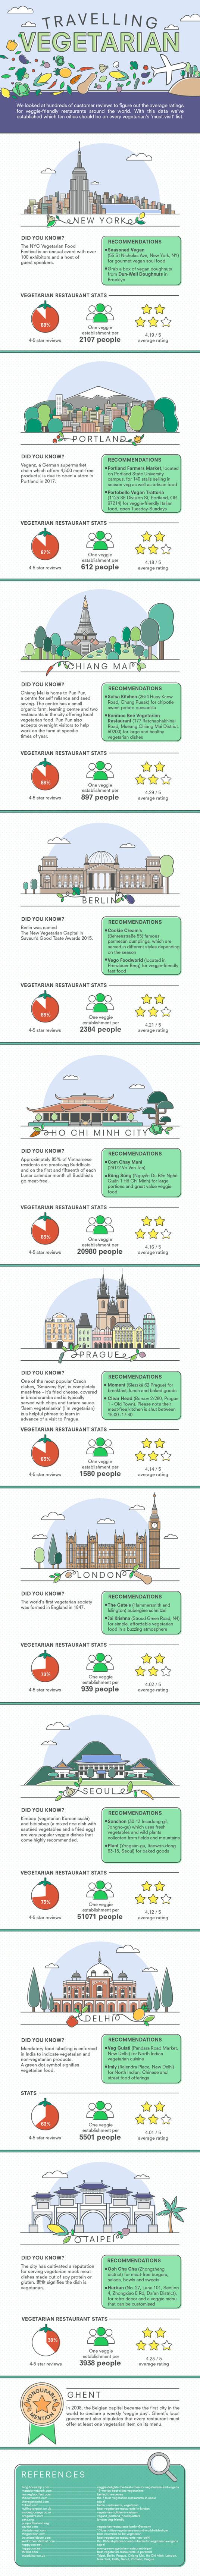 travelling-vegetarian